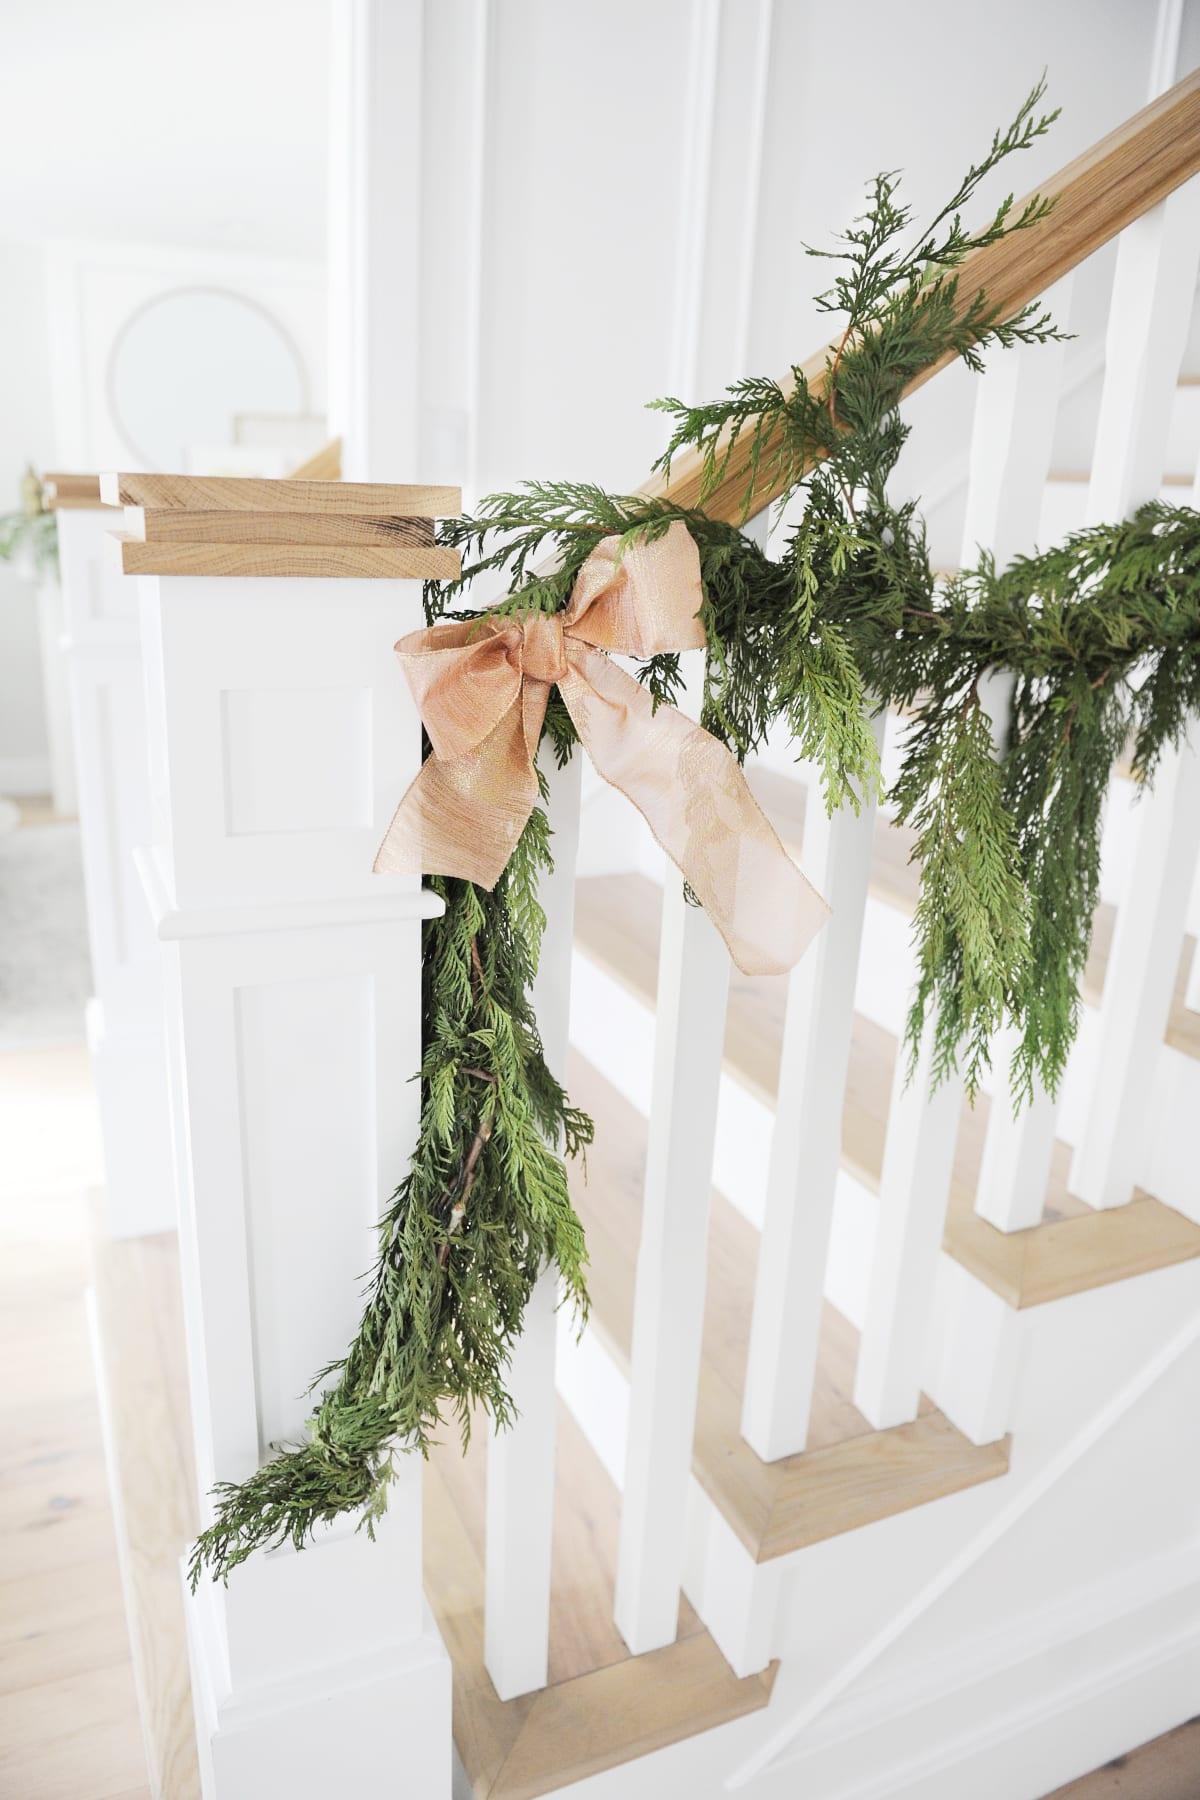 Christmas entry way decor ideas